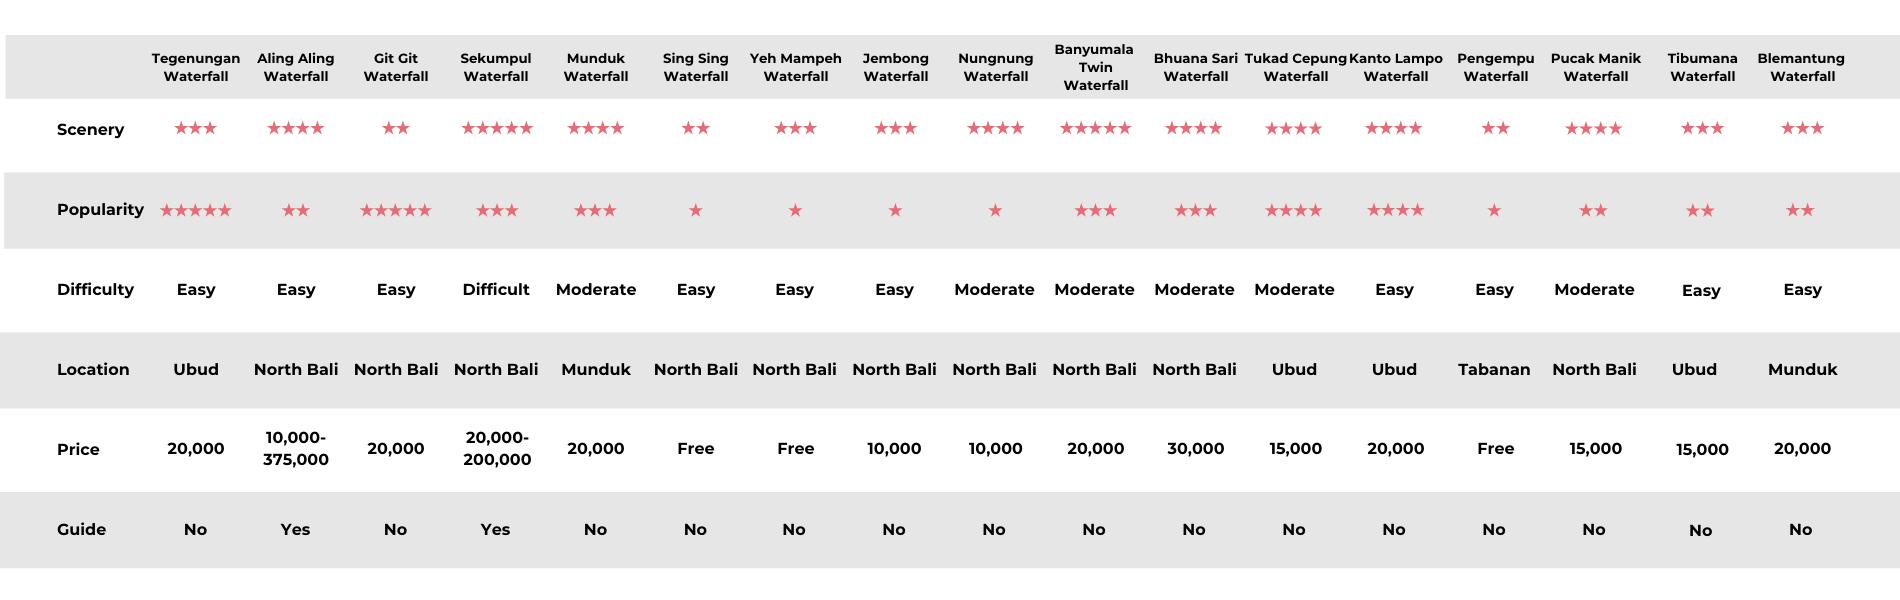 Bali Waterfall Guide